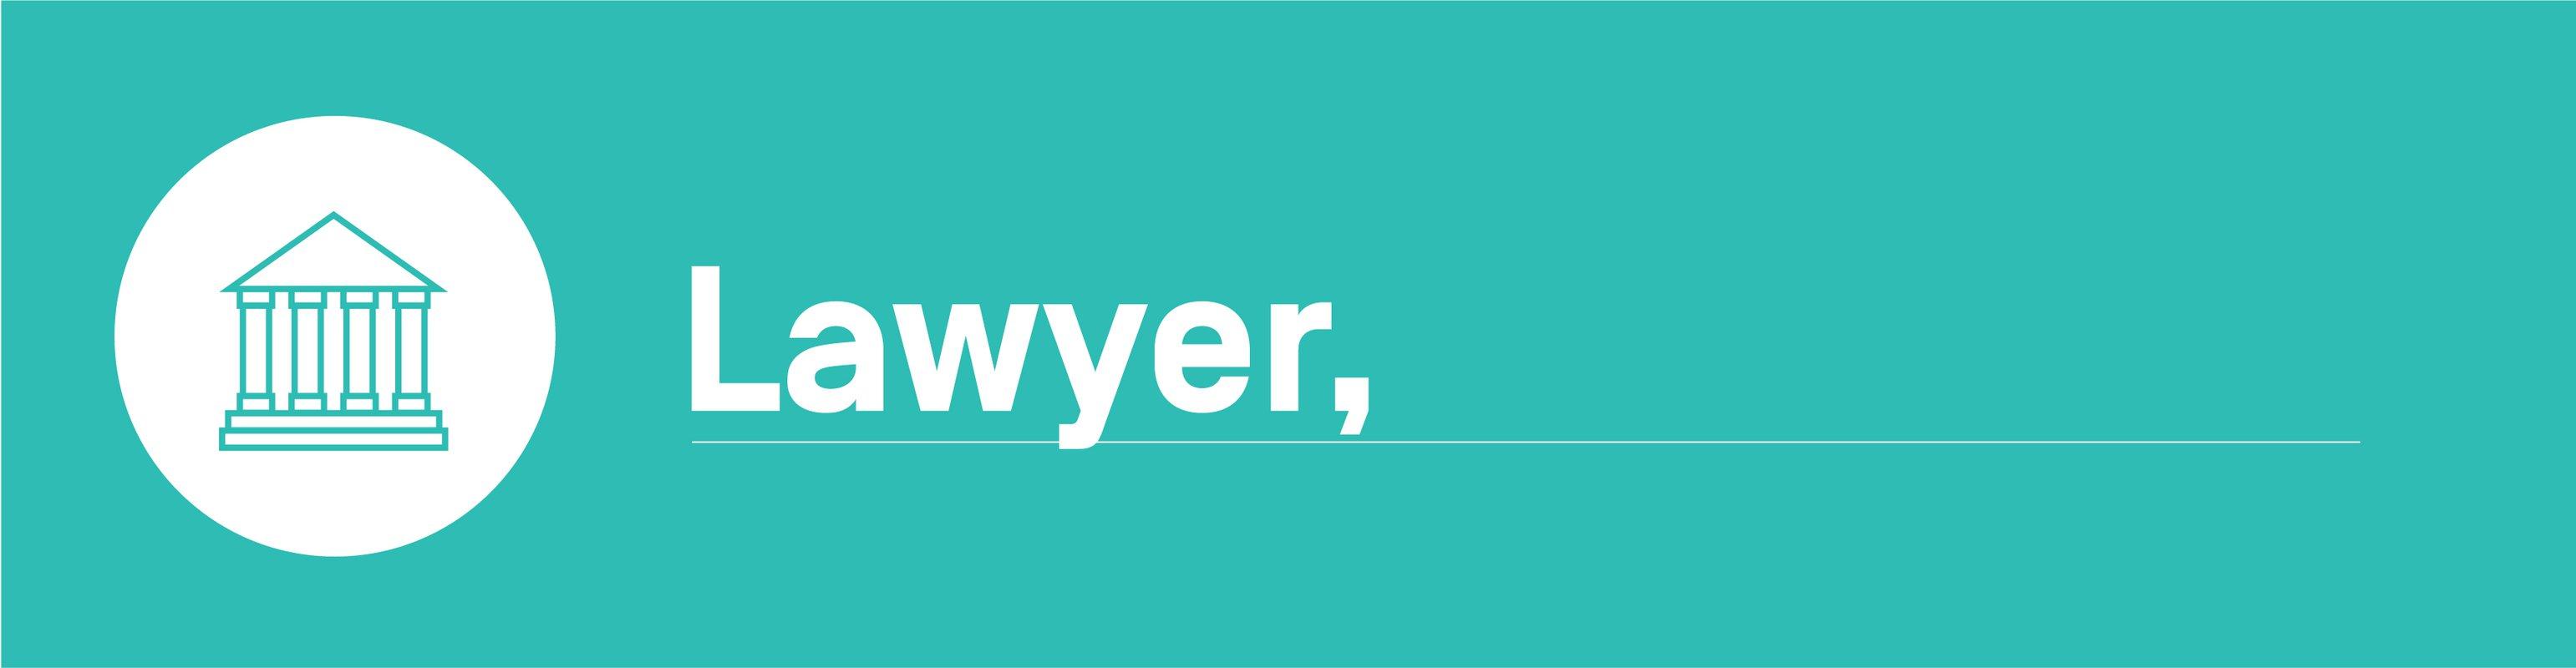 Algorithmic bias - lawyer